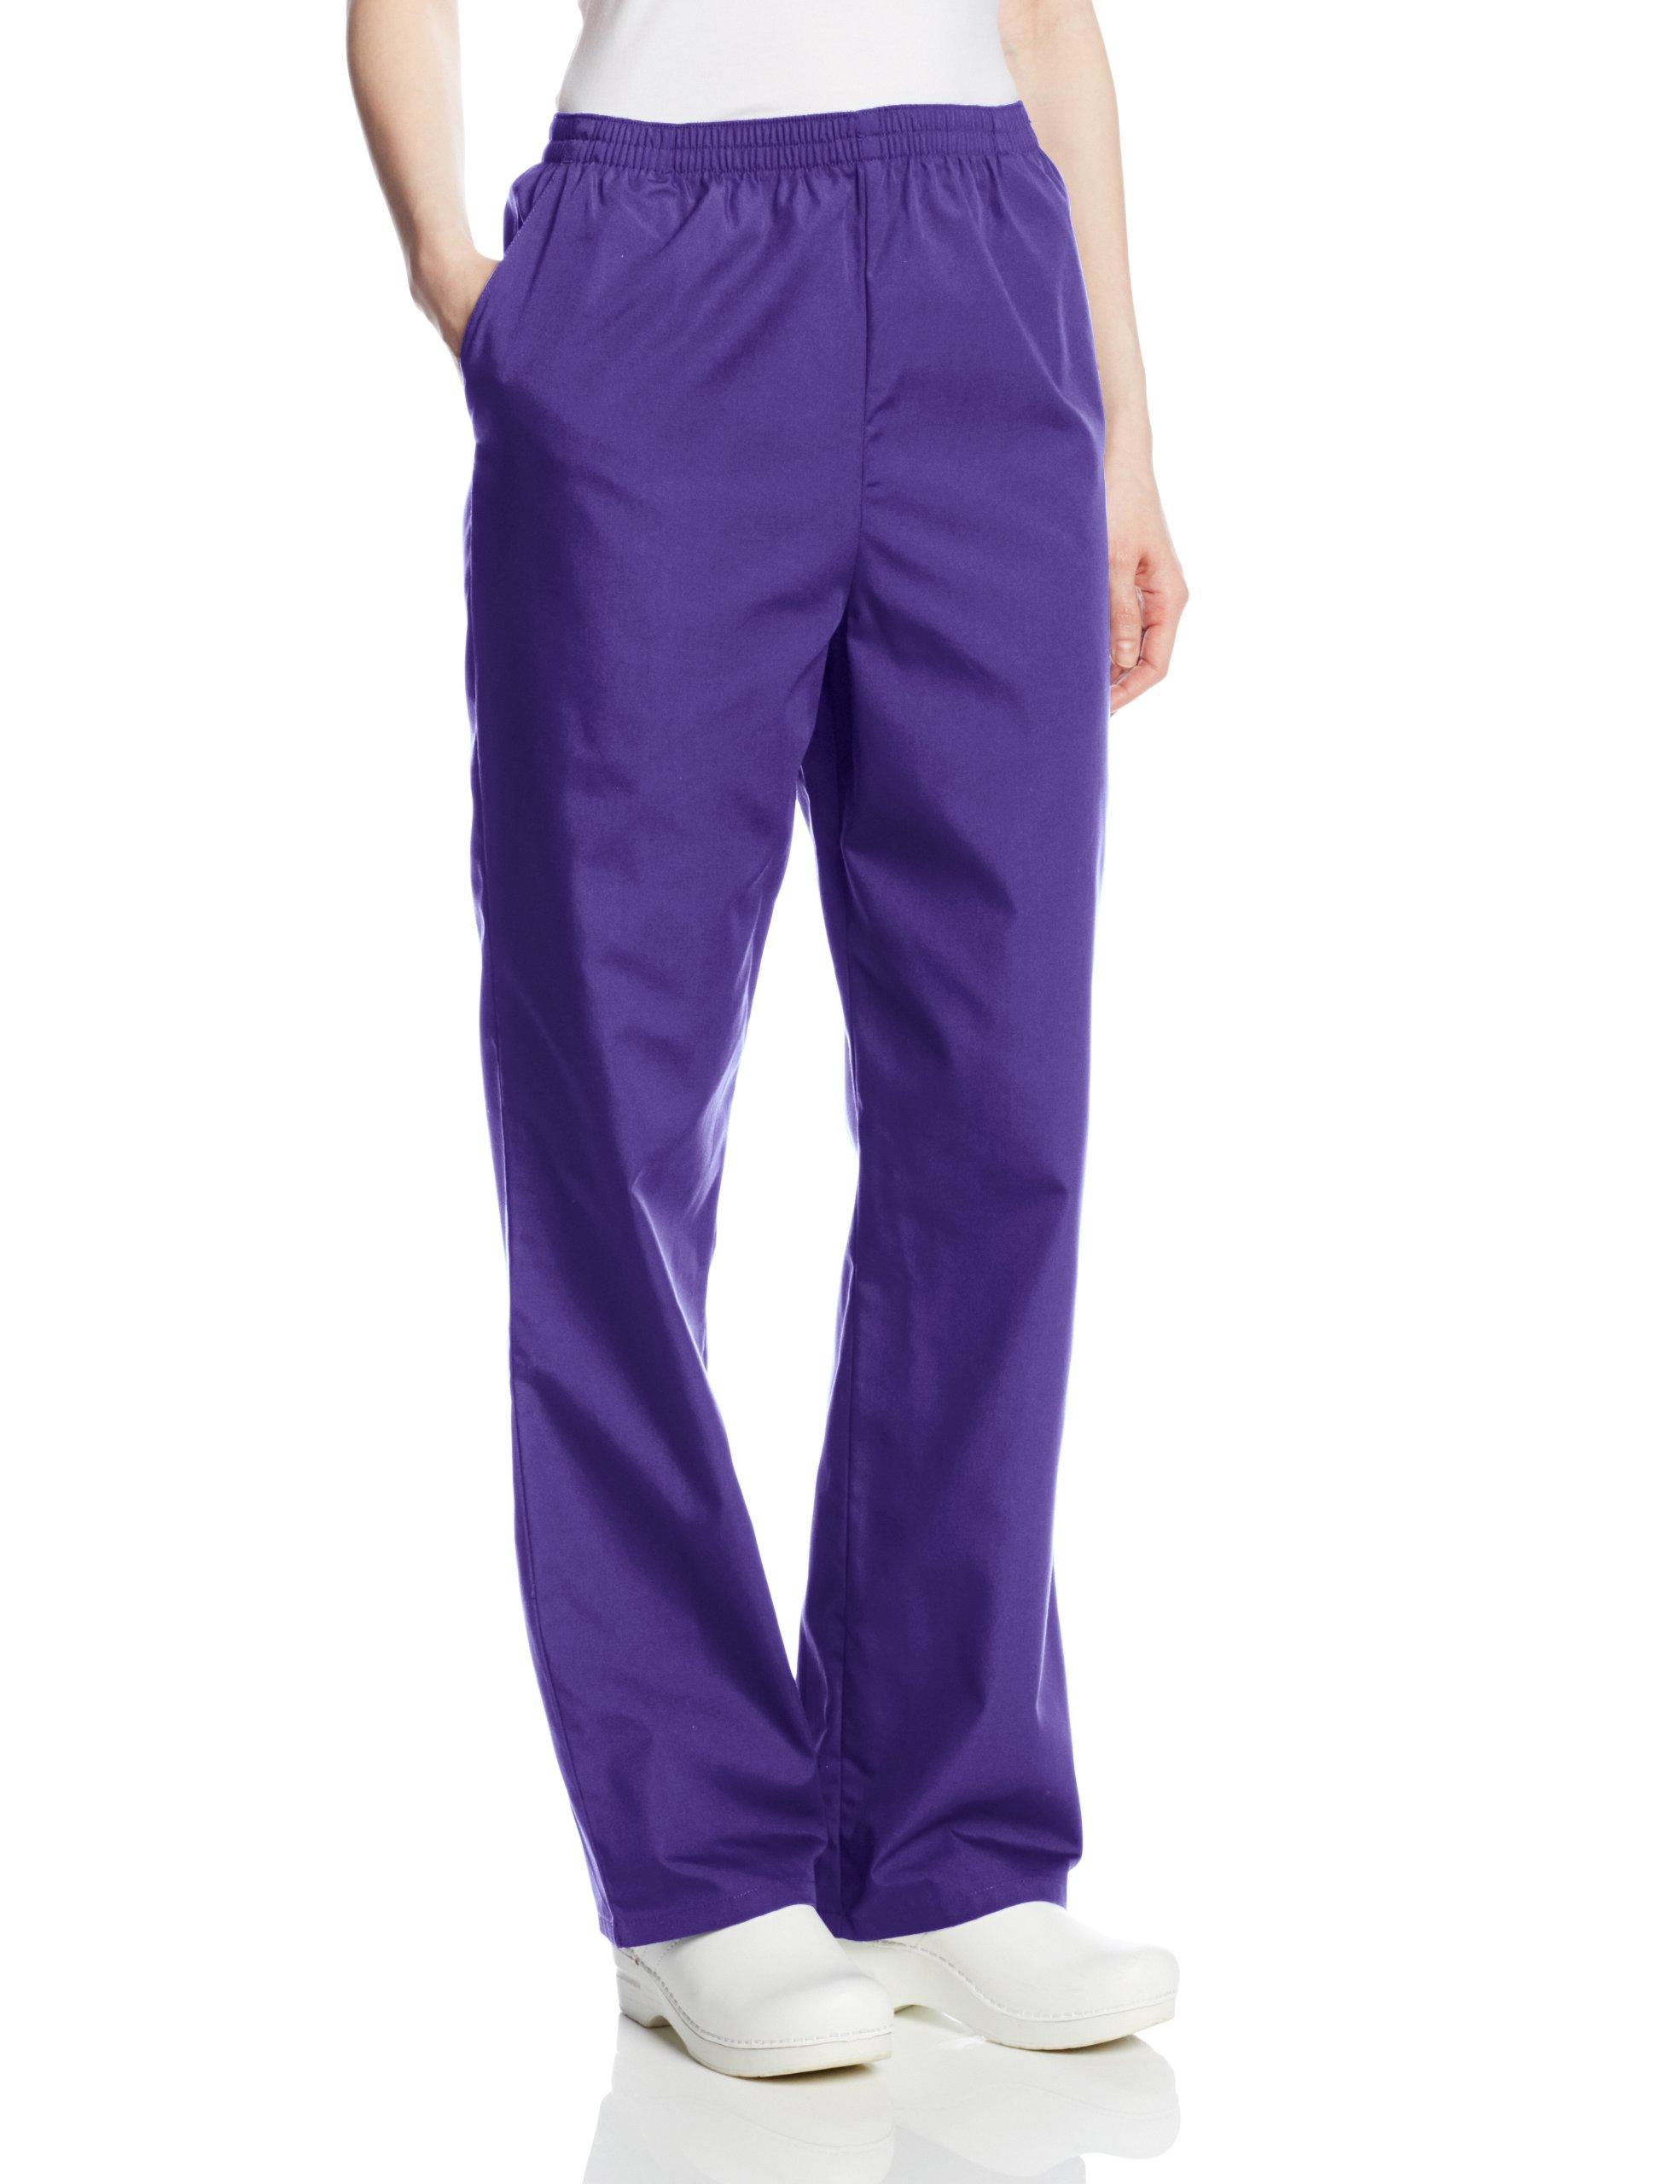 Cherokee Women's Workwear Scrubs Pull-On Pant (SIZE 2X-5X), Grape, 2X-Large-Petite